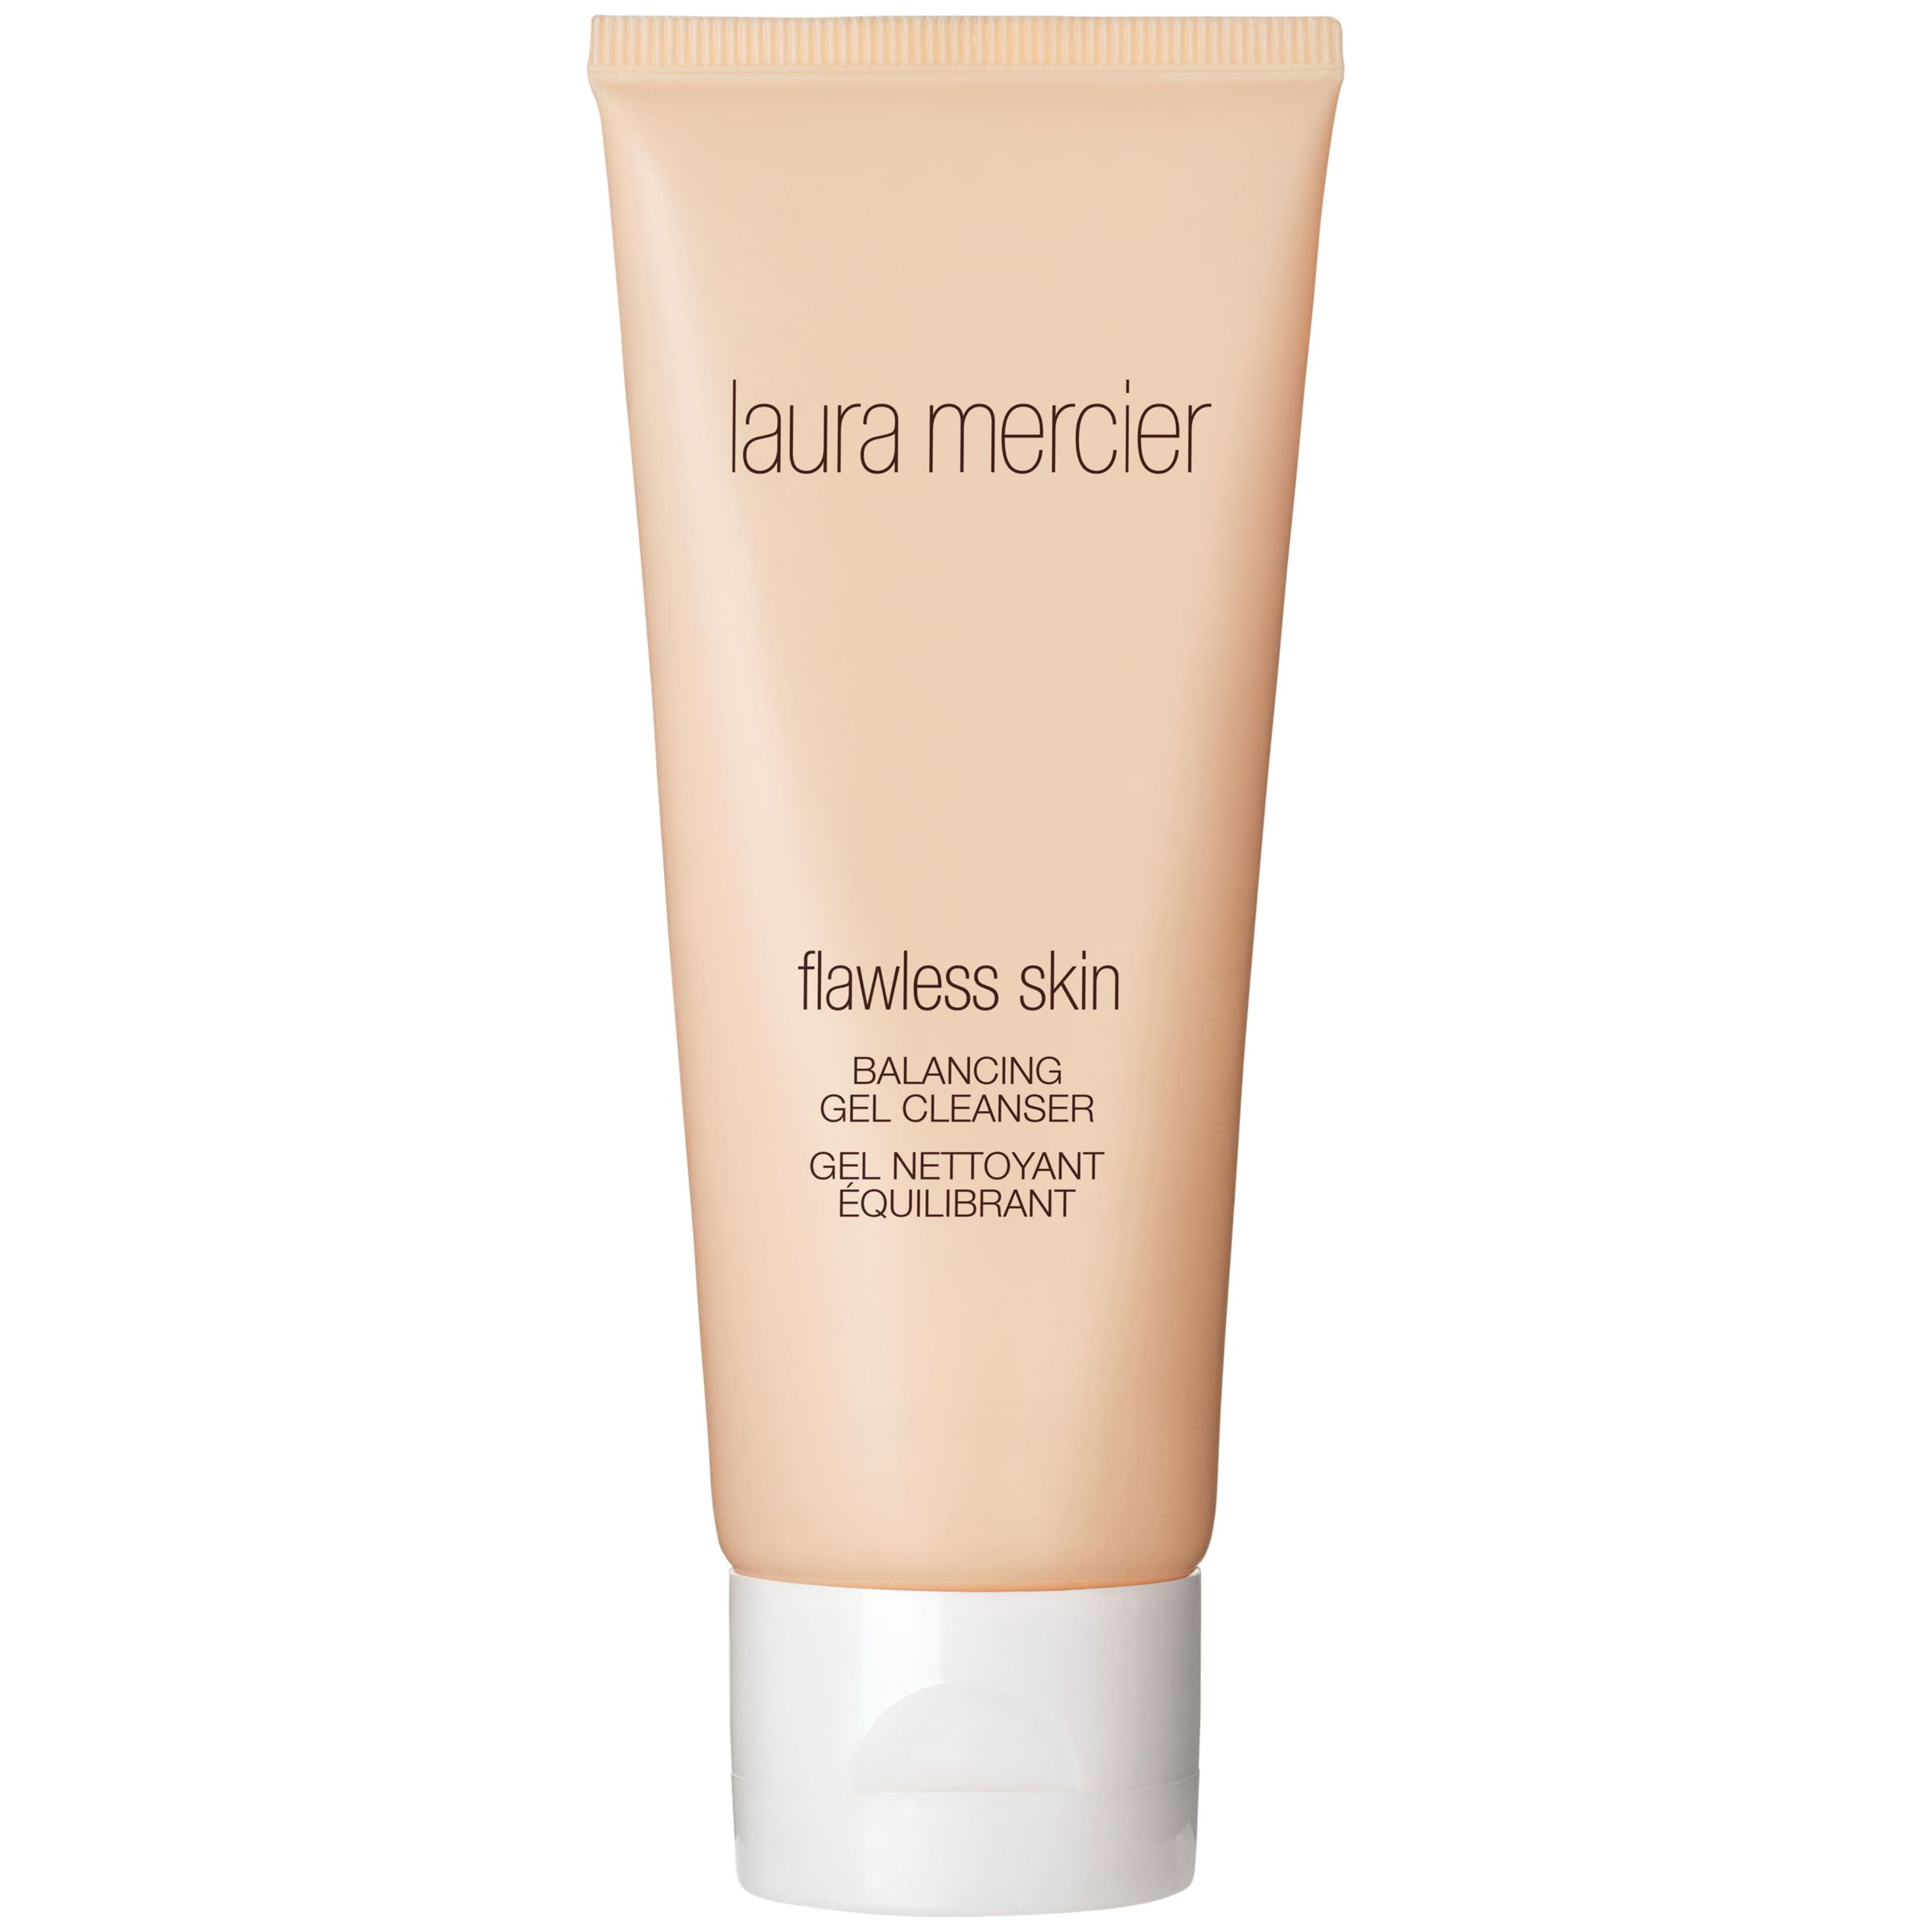 Laura Mercier Laura Mercier Flawless Skin Balancing Gel Cleanser, 125ml